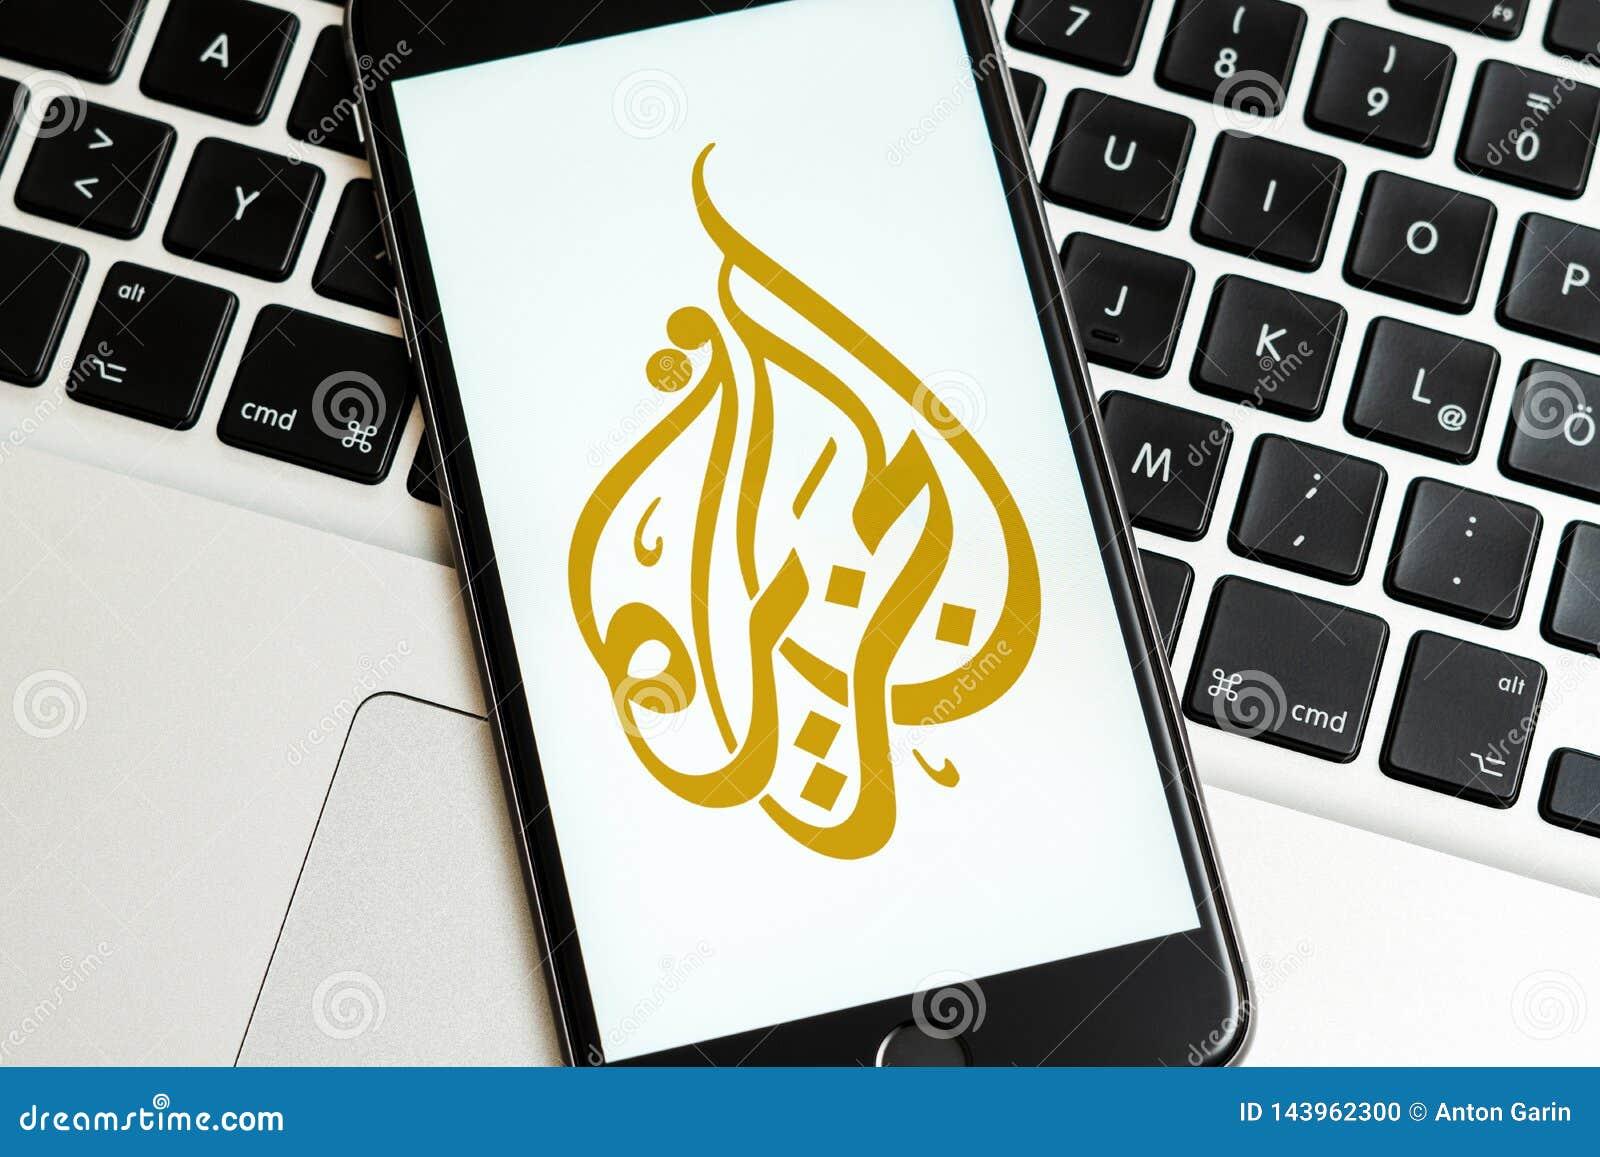 Telefone preto com logotipo dos meios noticiosos Al Jazeera na tela